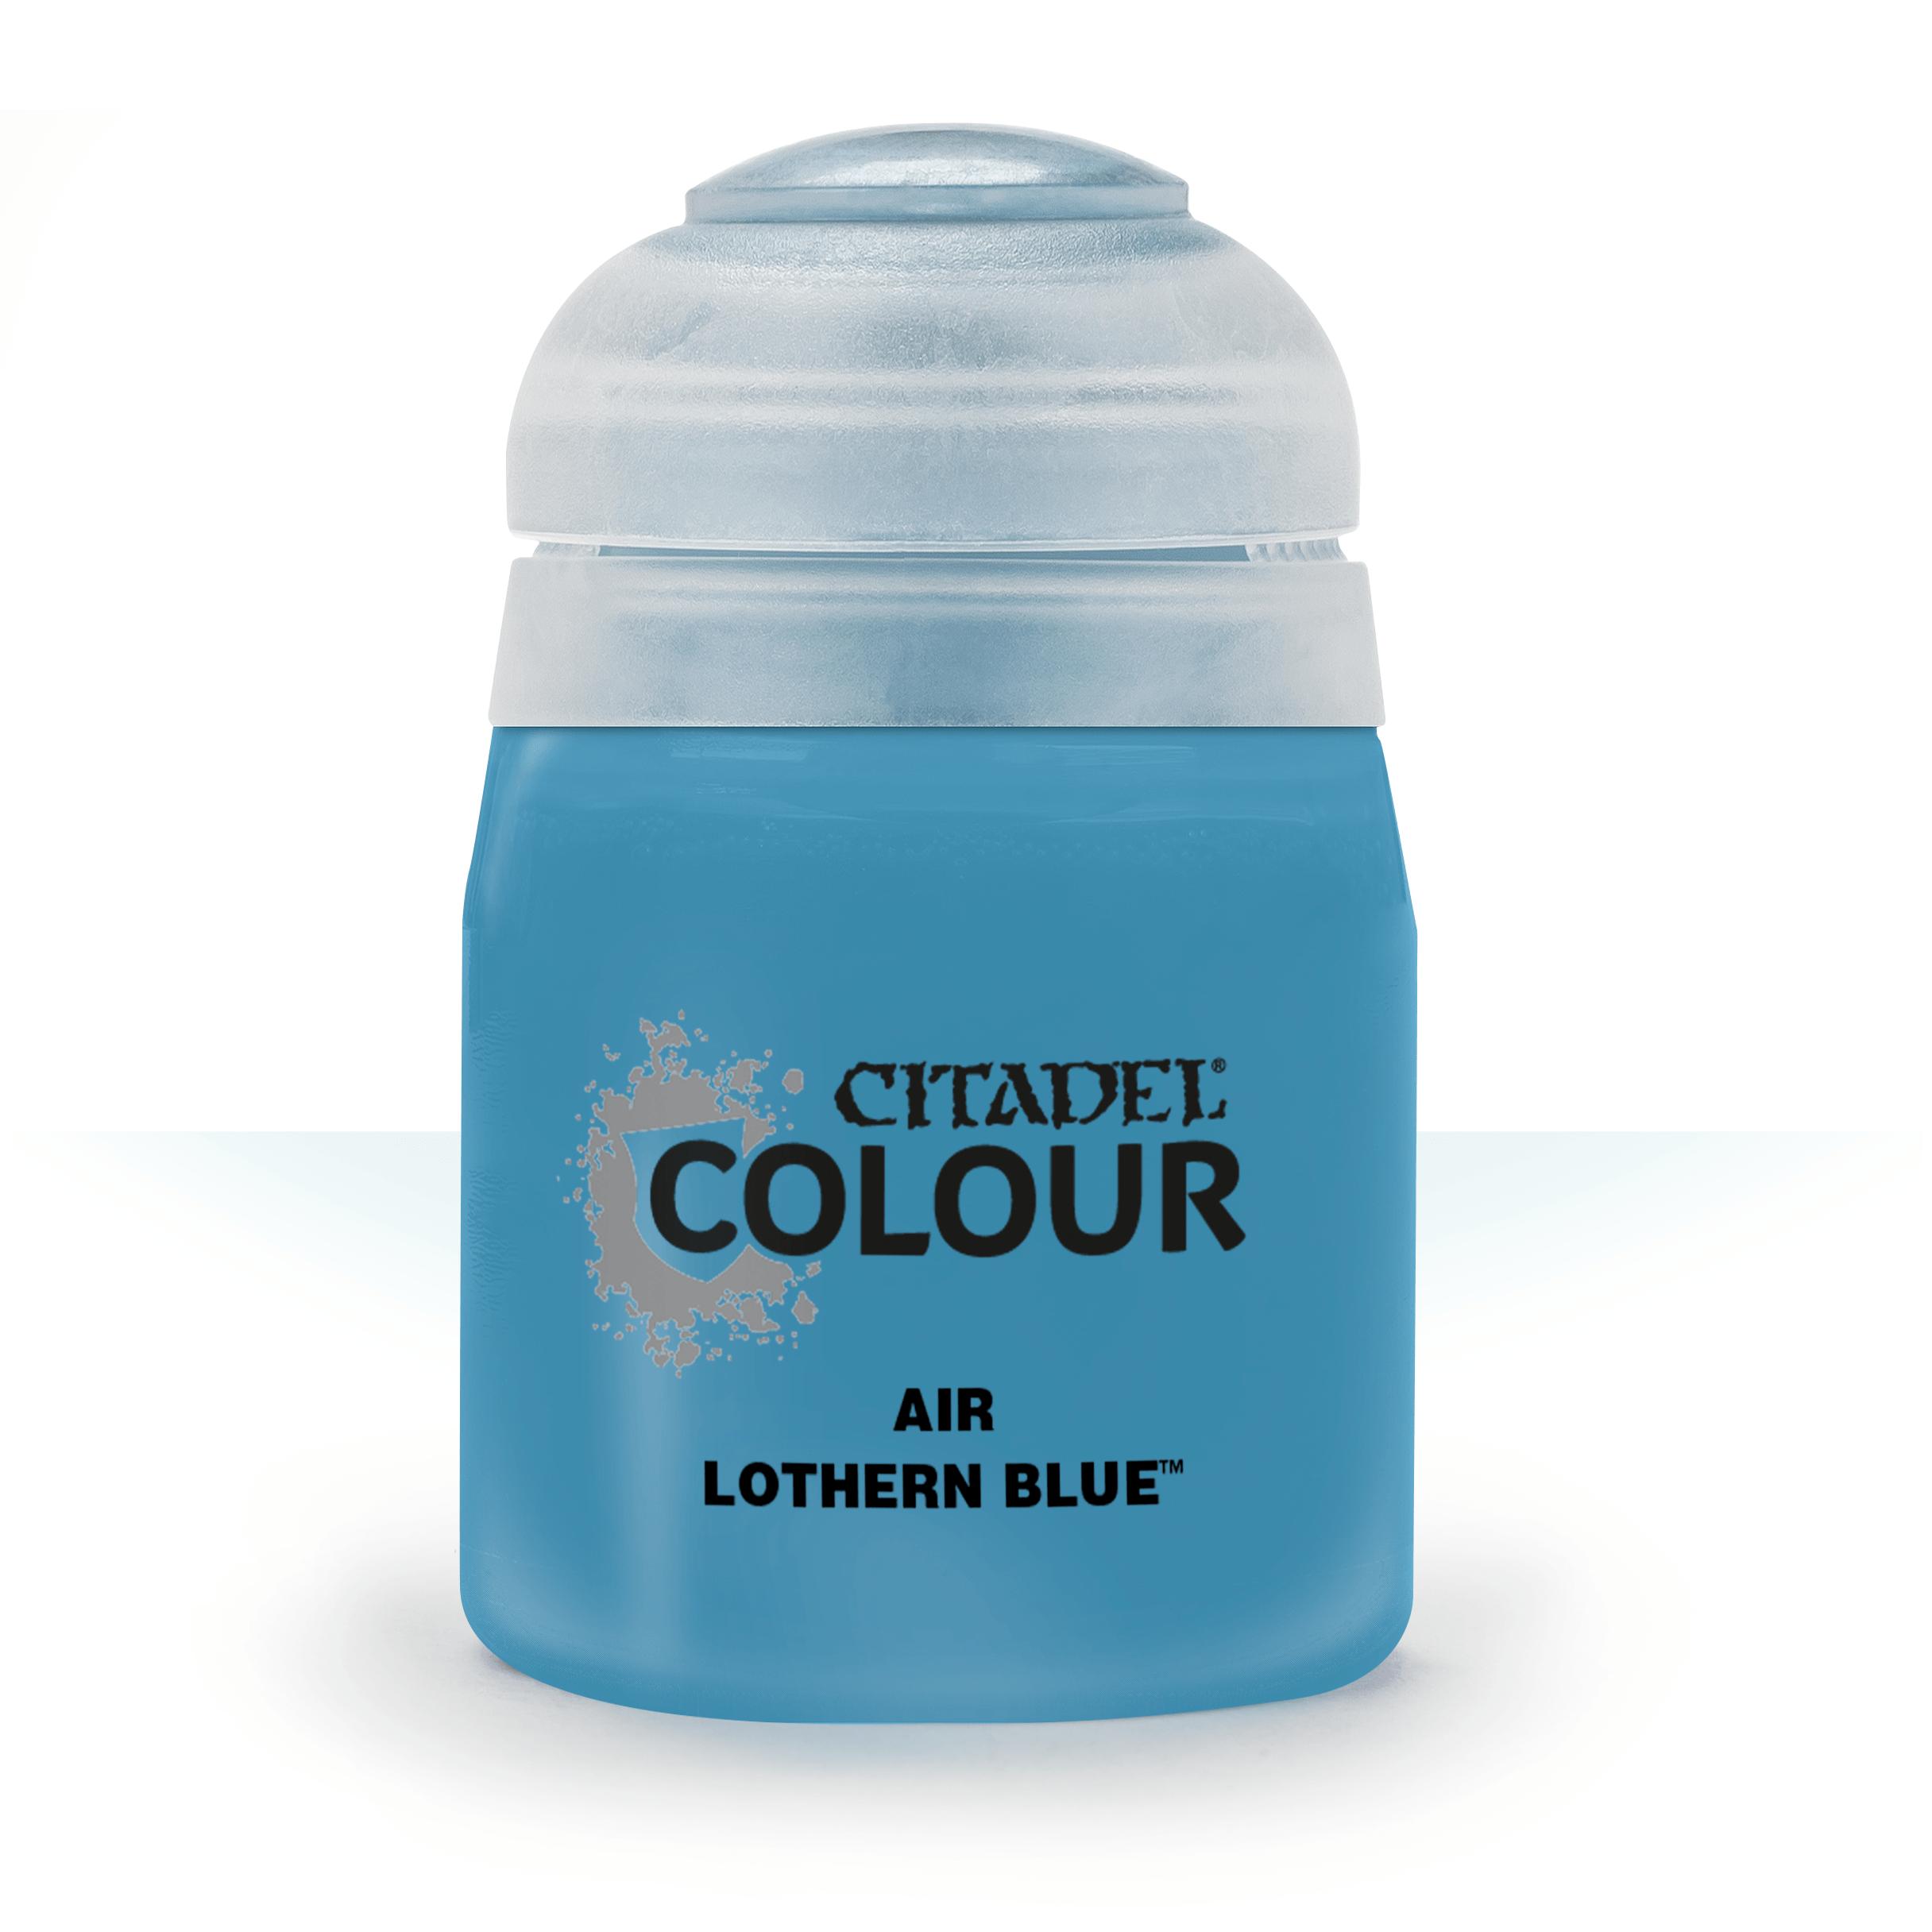 Lothern Blue, Citadel Air 24ml